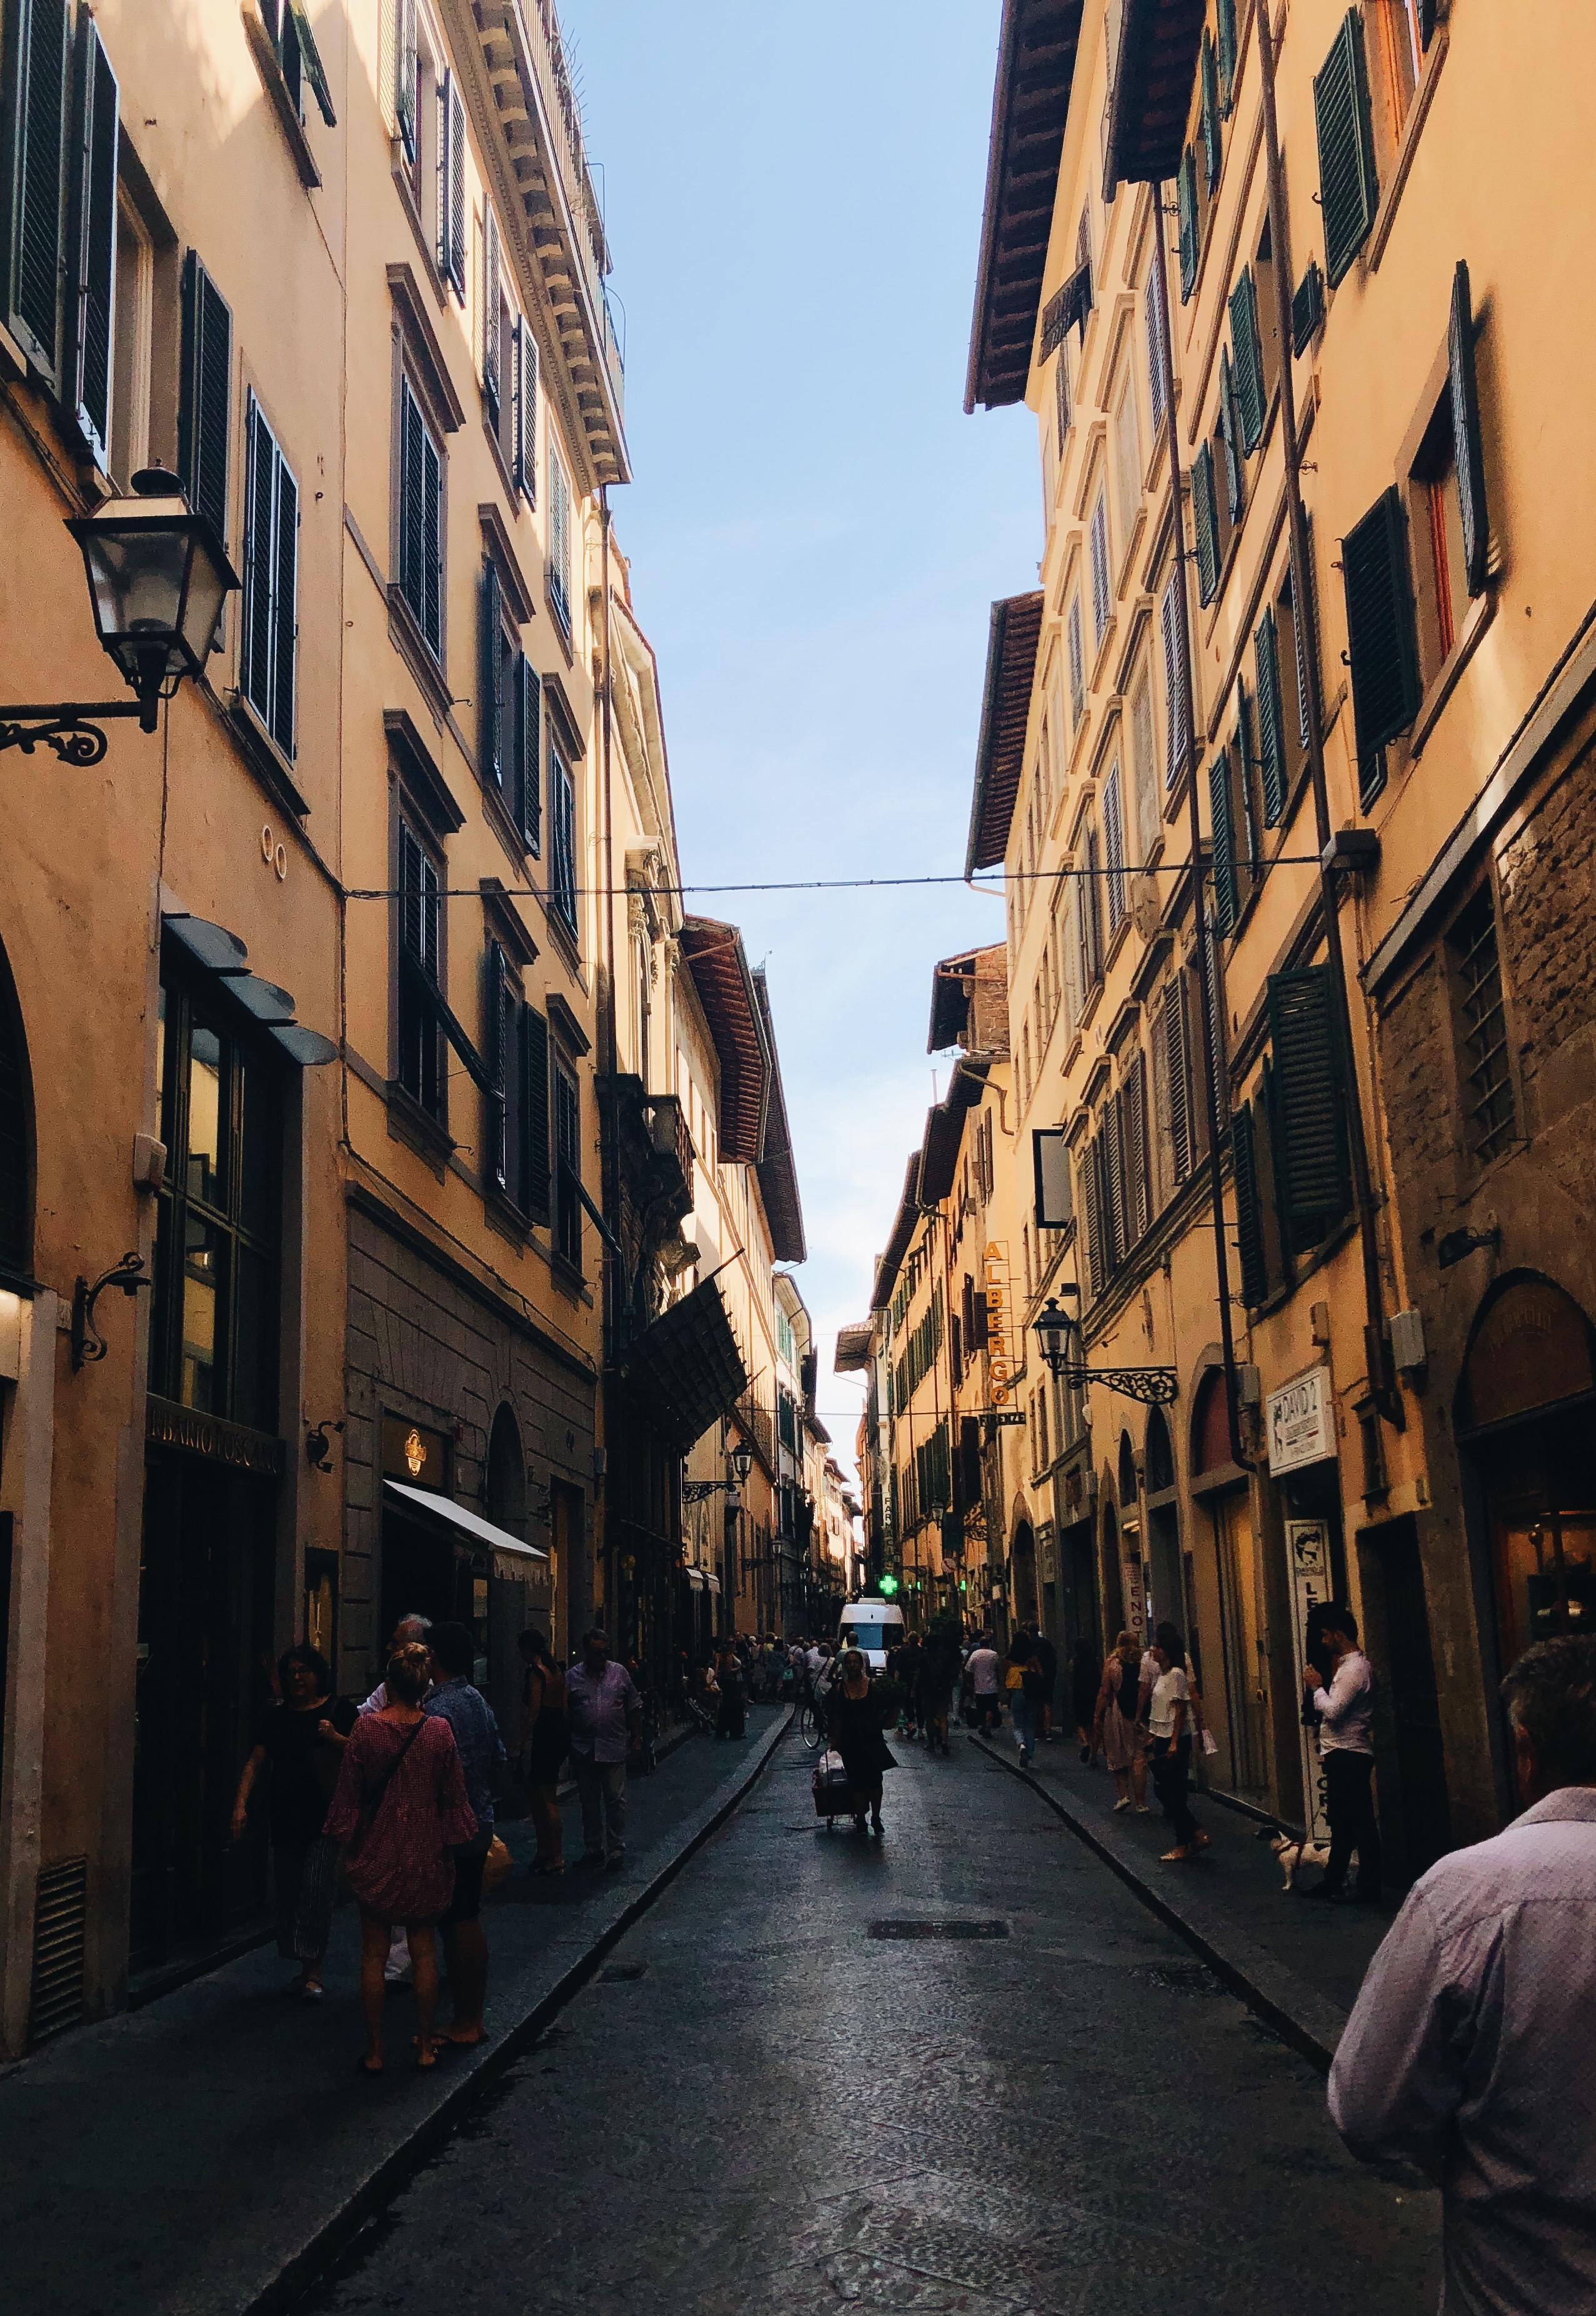 Walking Through the City